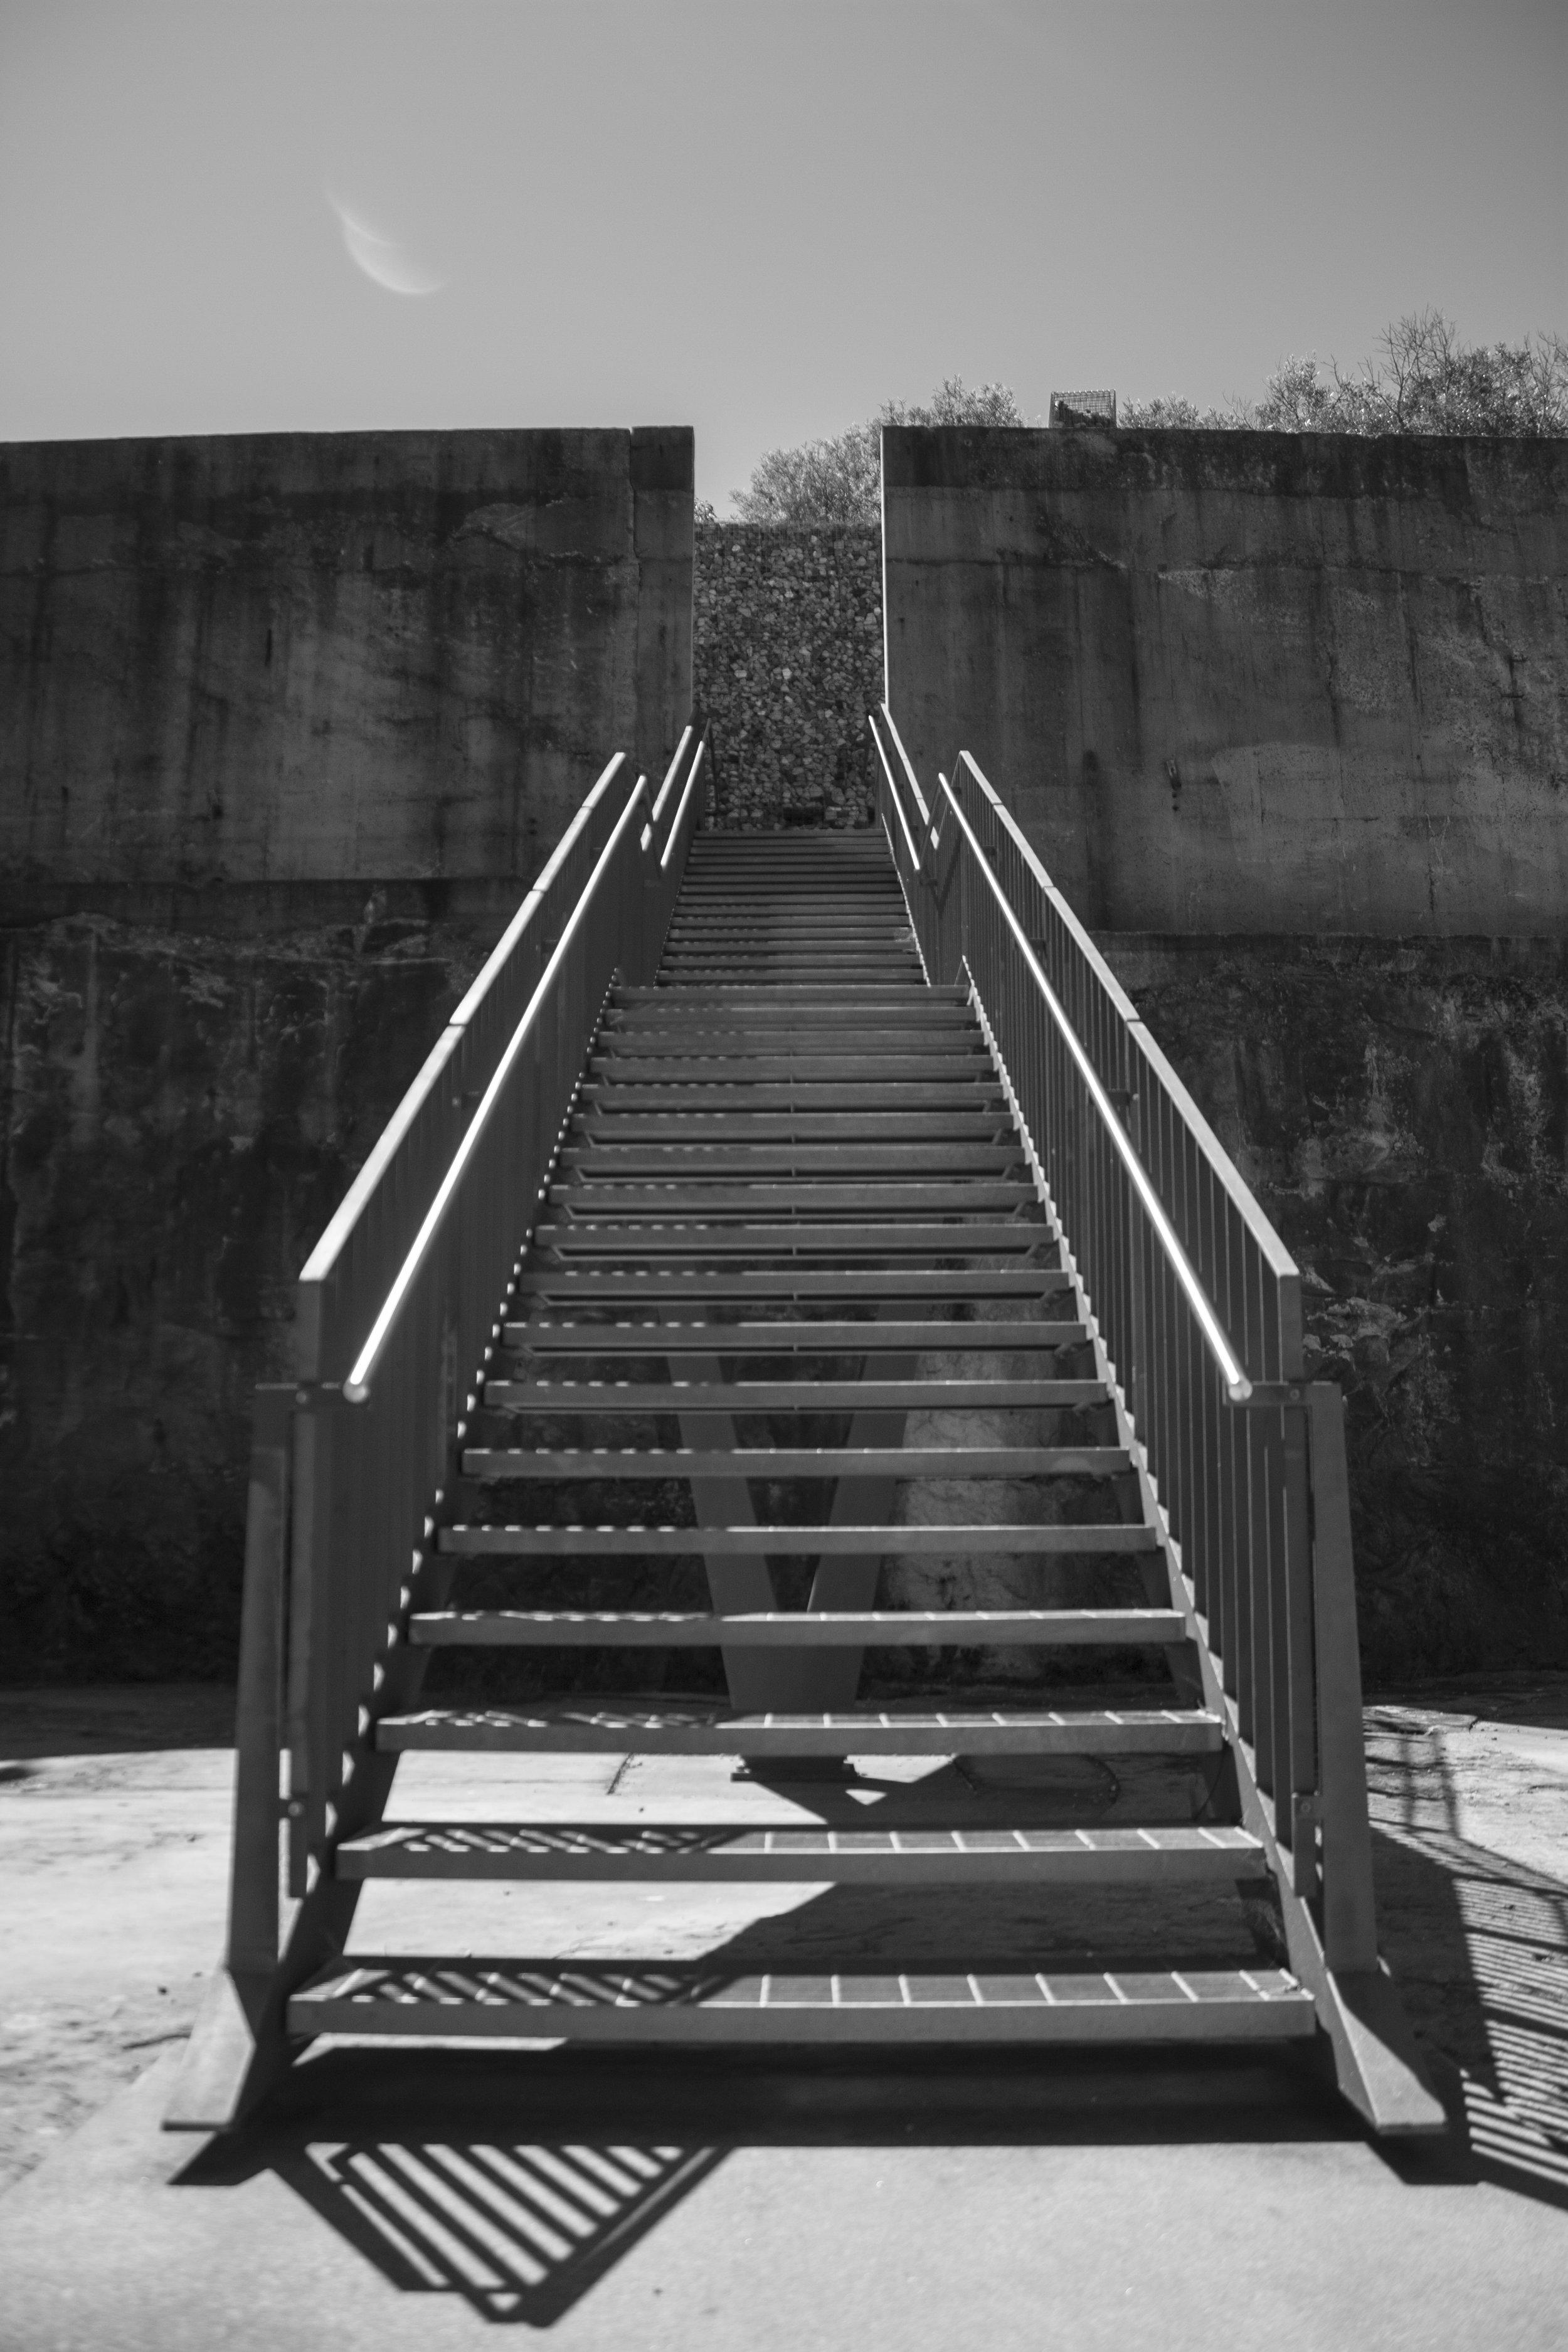 Australia_Sydney_Ballast Point Park_Staircase to Wall.jpg